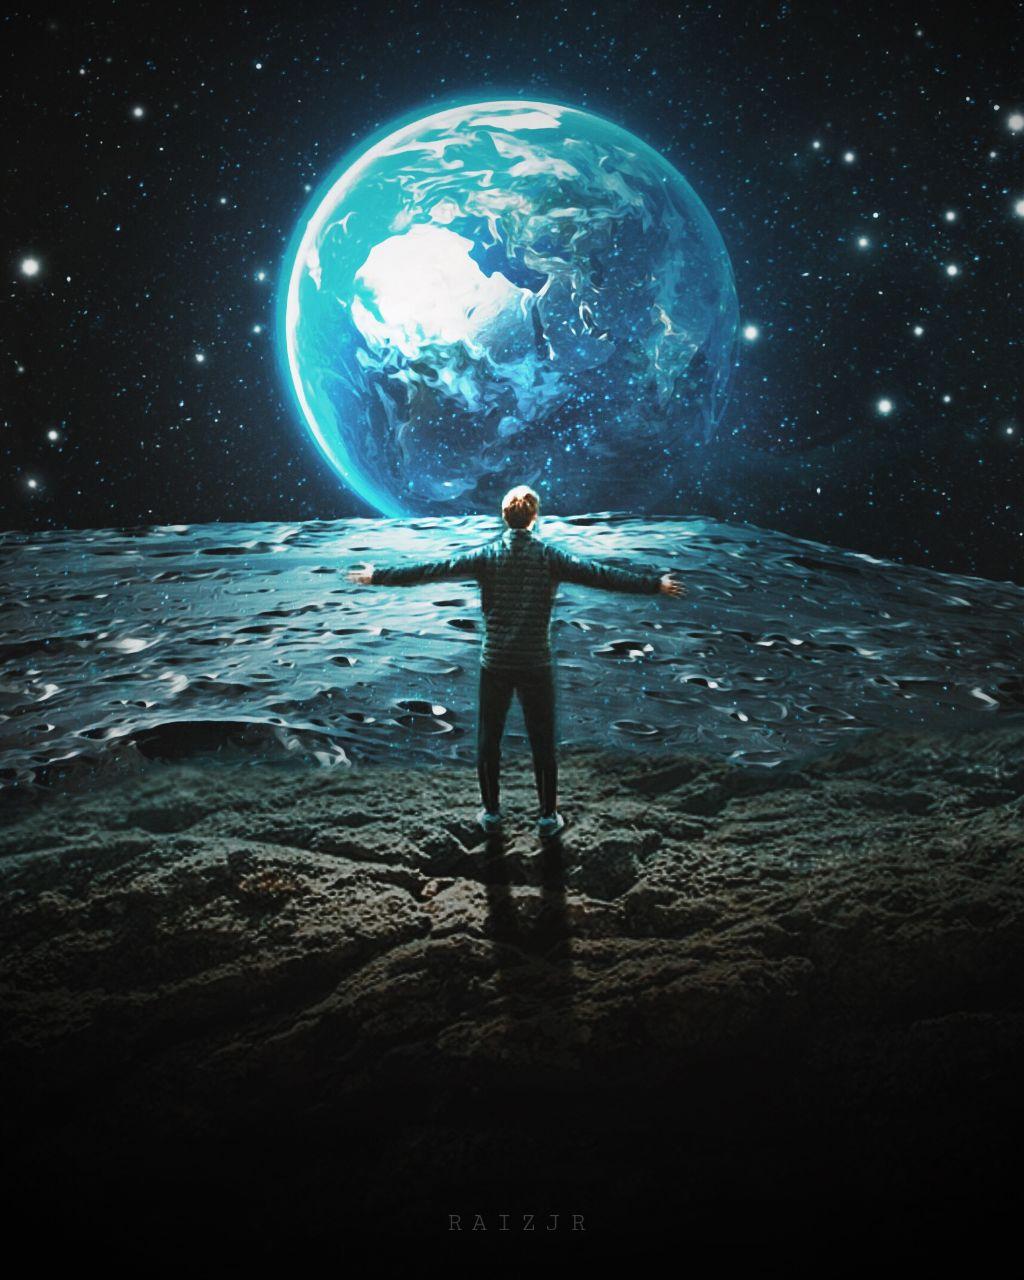 Embrace the world (v1)  Whats your favorite?  @picsart @freetoedit    #picsart #madewithpicsart #edit #editing #photography #photoediting #photoeditor #art #visual #visualart #visualartist #digital #digitalart #digitalartist #nature #surreal #fantasy #world #earth #man #freetoedit